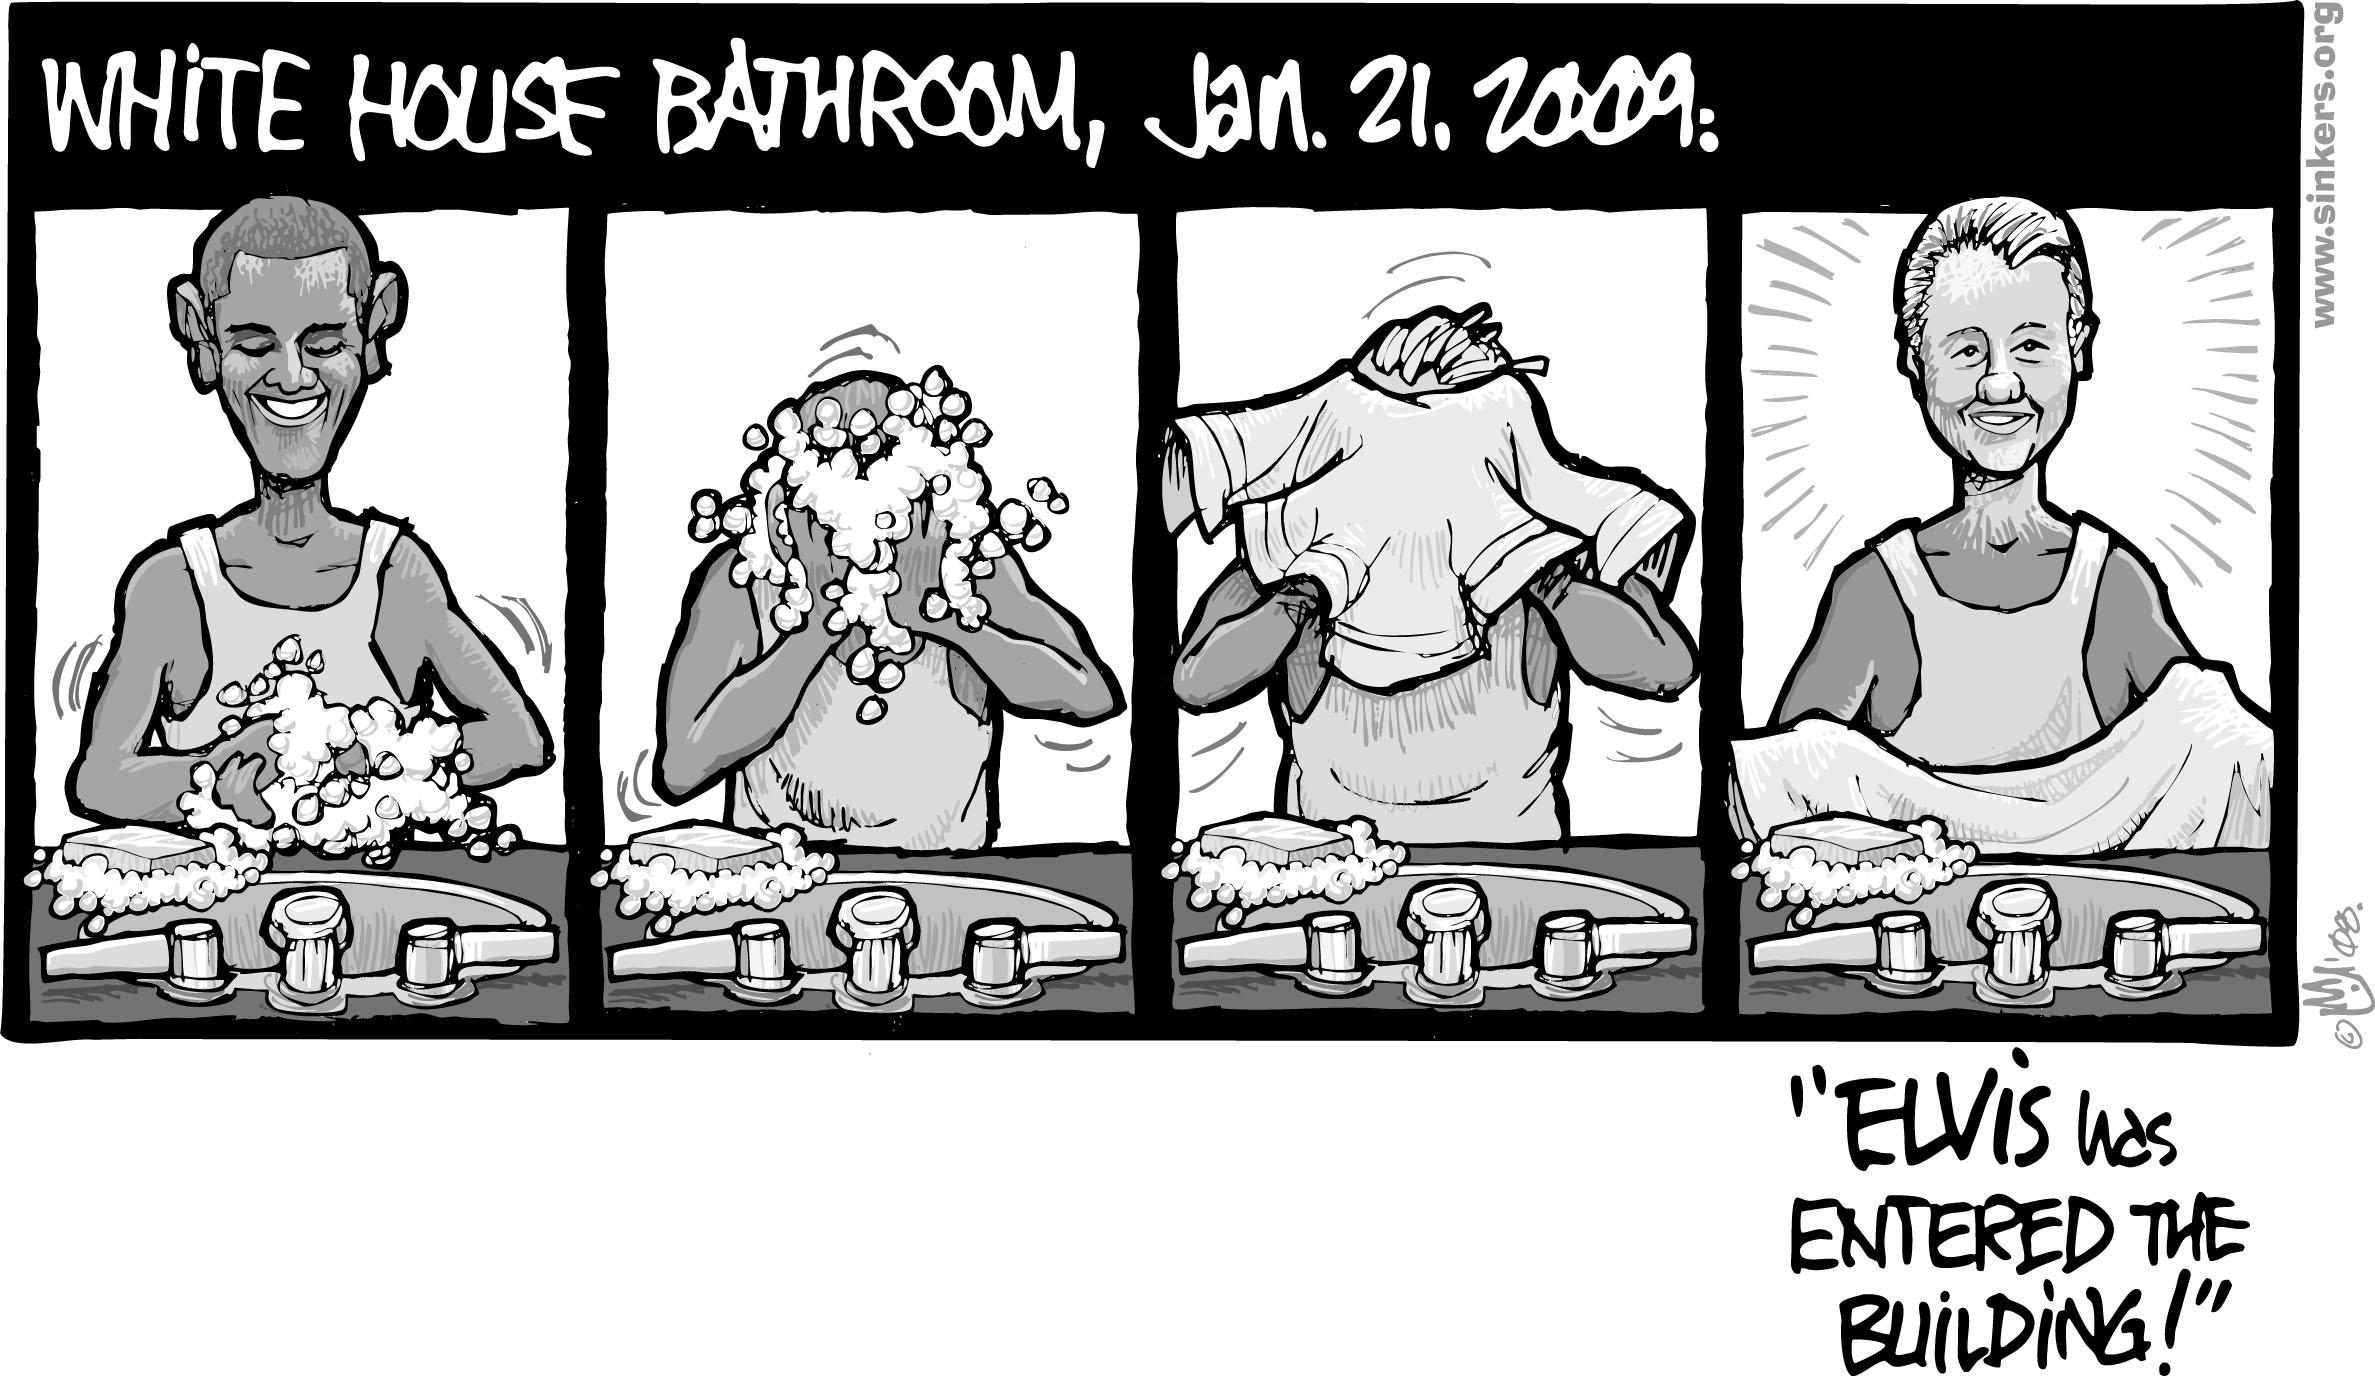 White house bathroom - Medium Res Jpg Image 584k